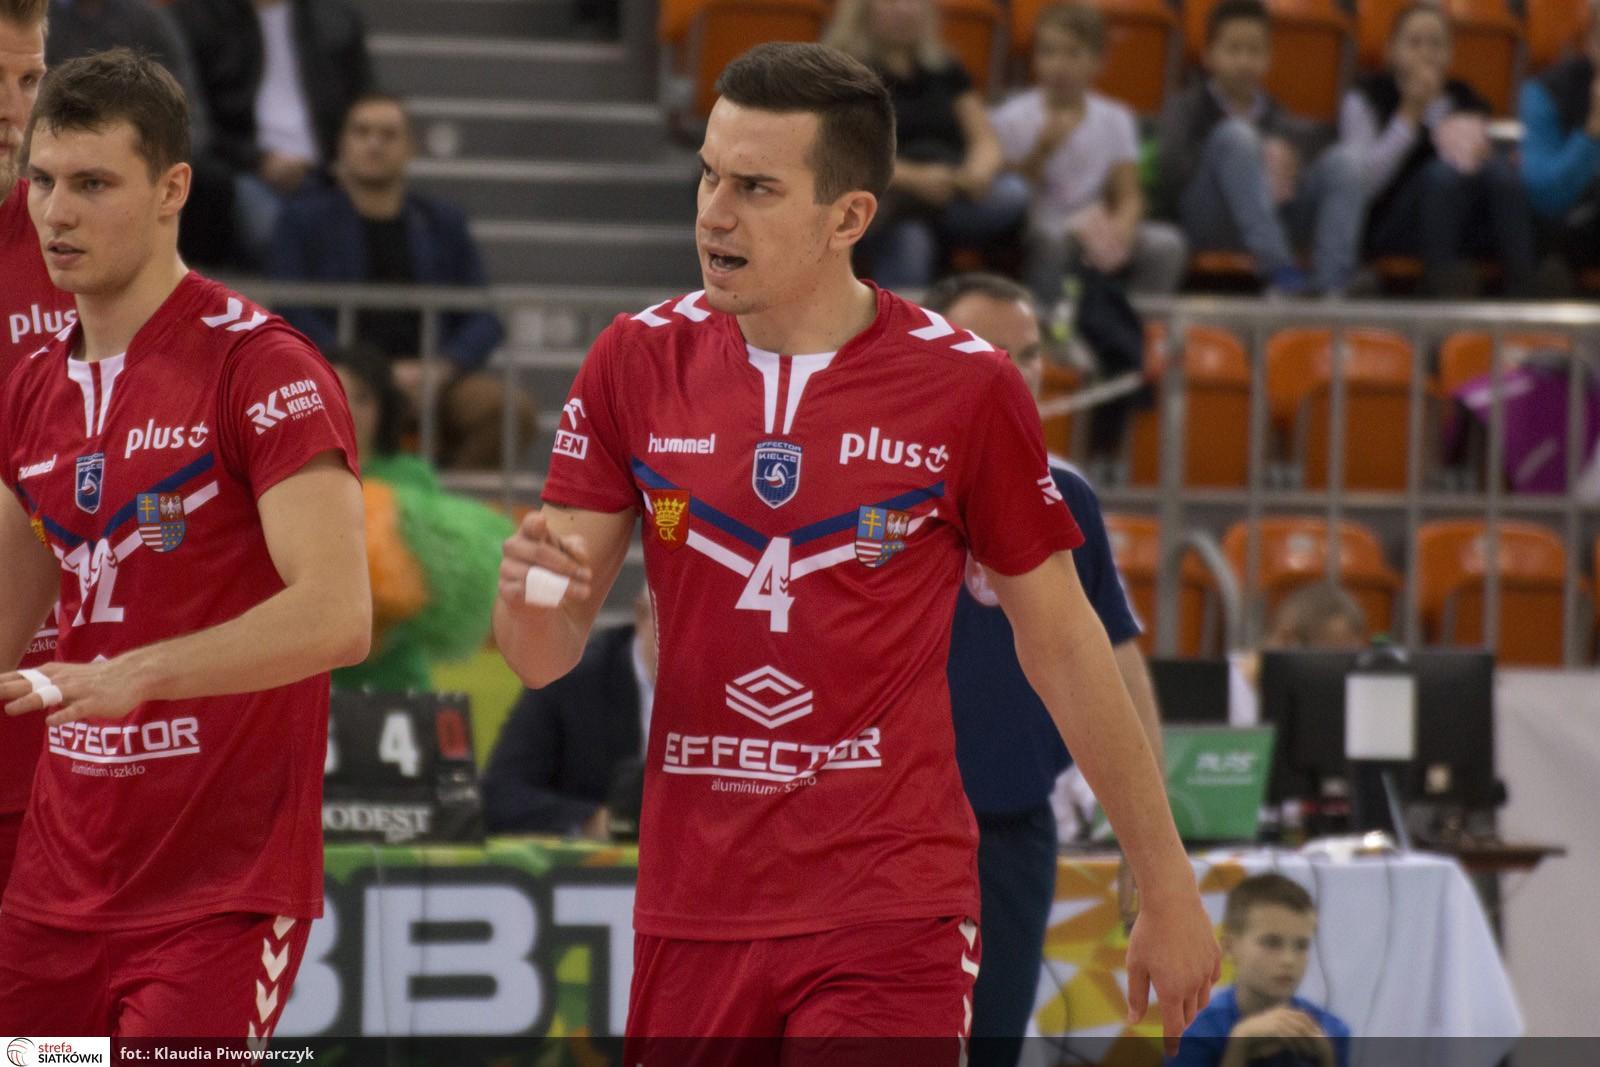 2 - Marcin Komenda